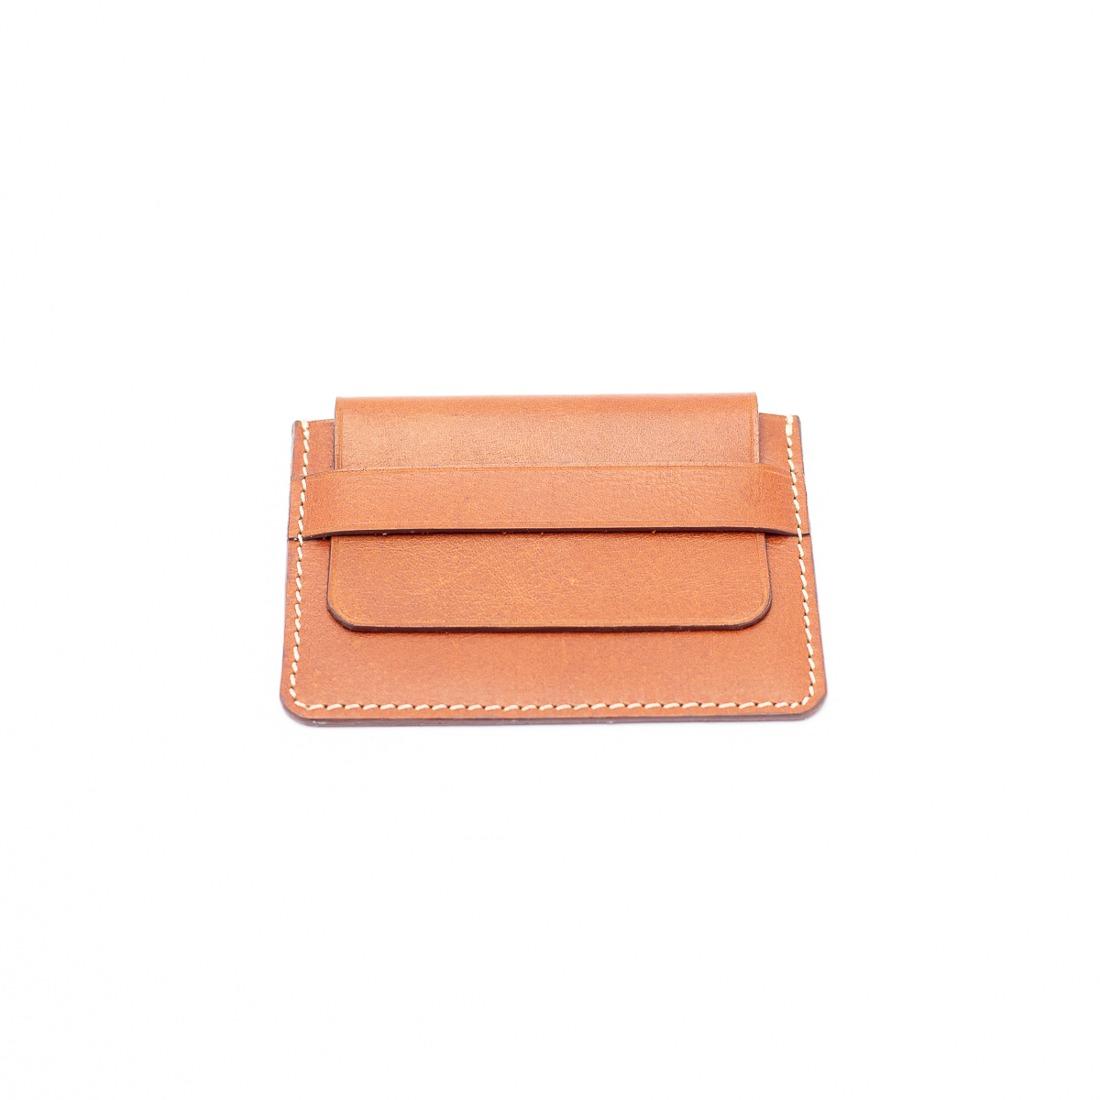 Sauve Business Card case with Flap